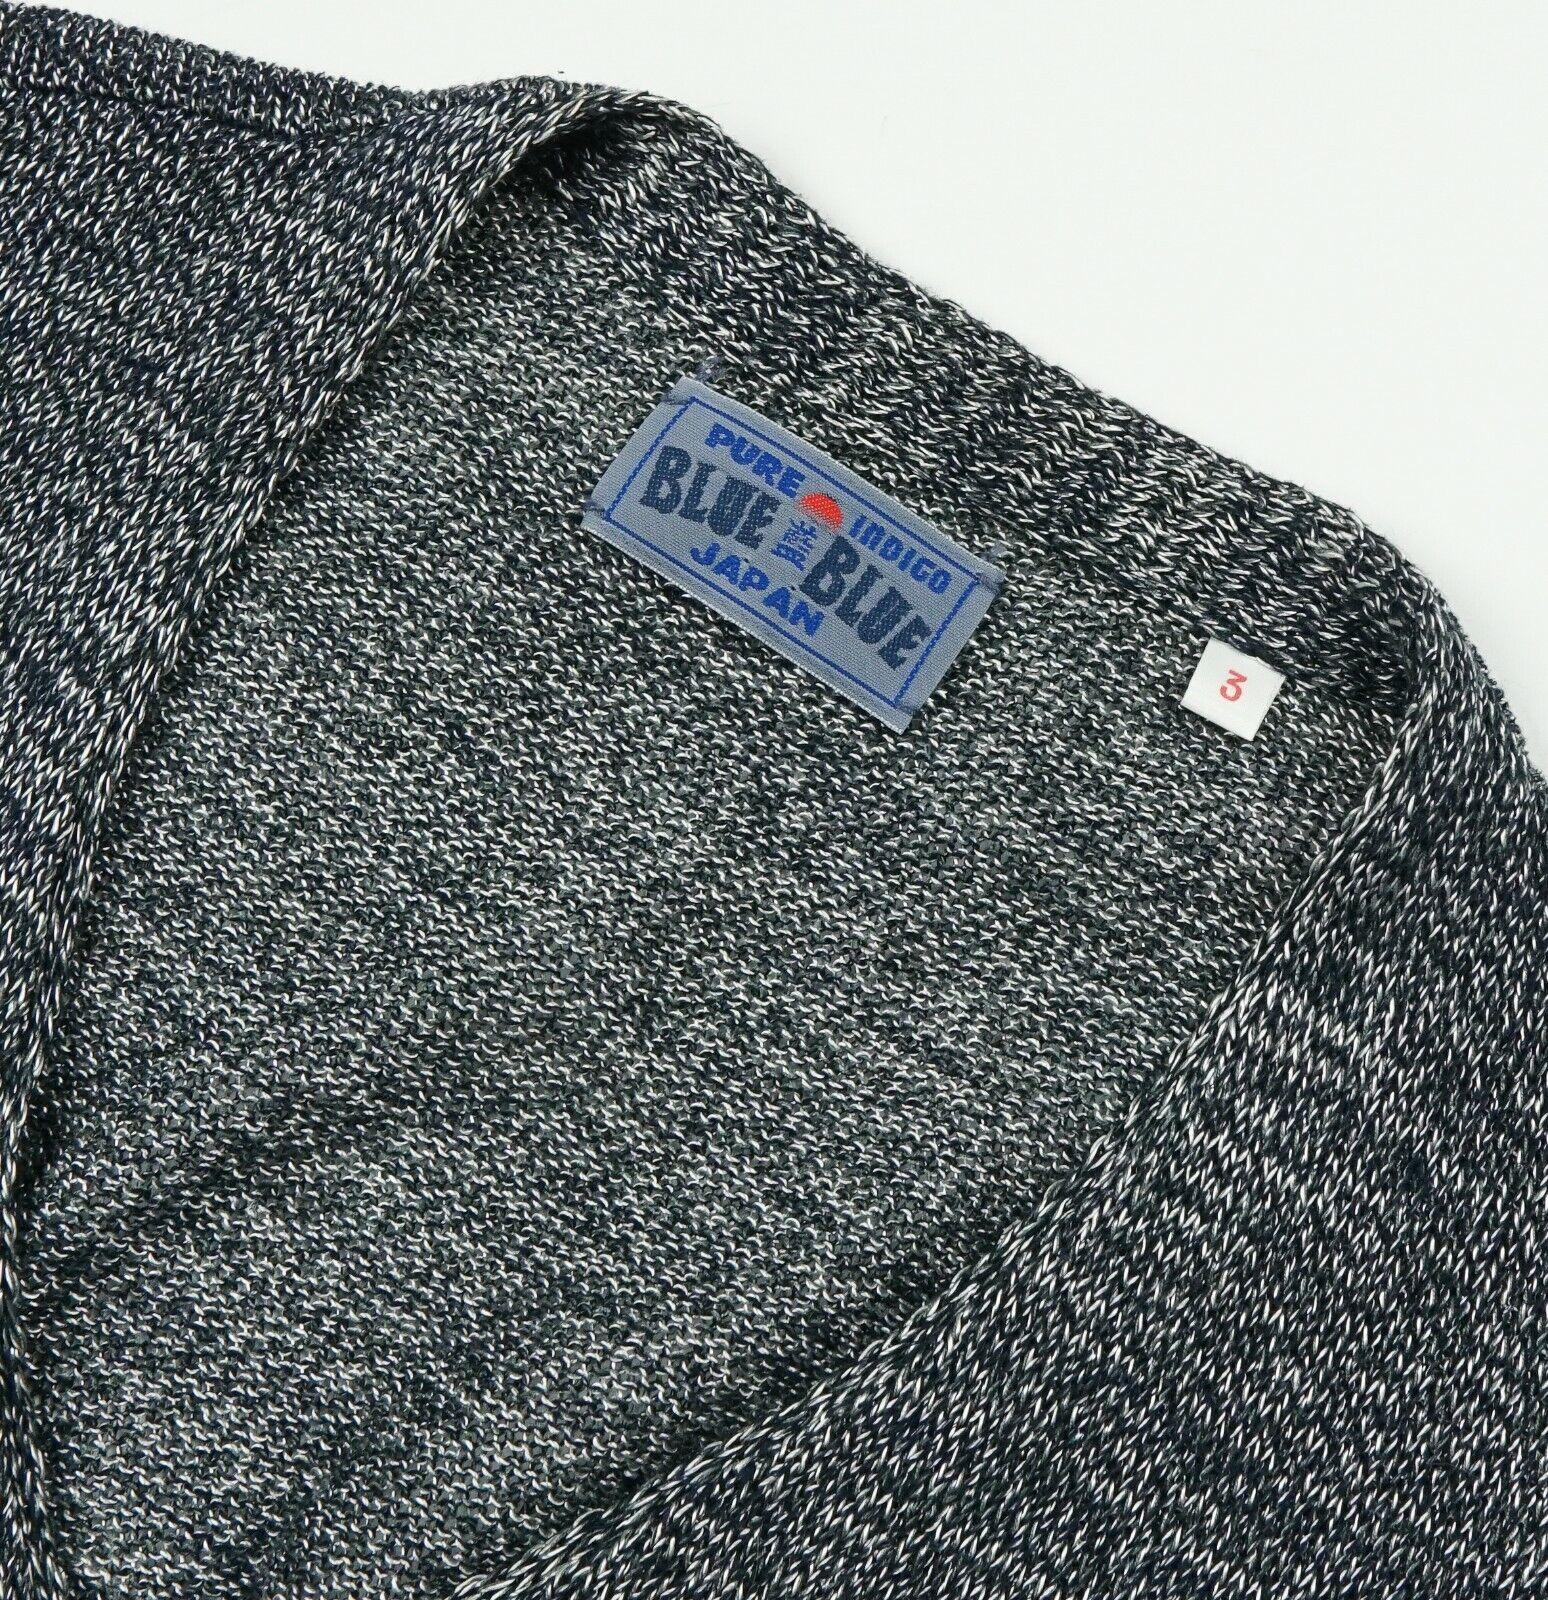 Blue Blue Japan Cotton Rayon Pure Indigo Knit Car… - image 2